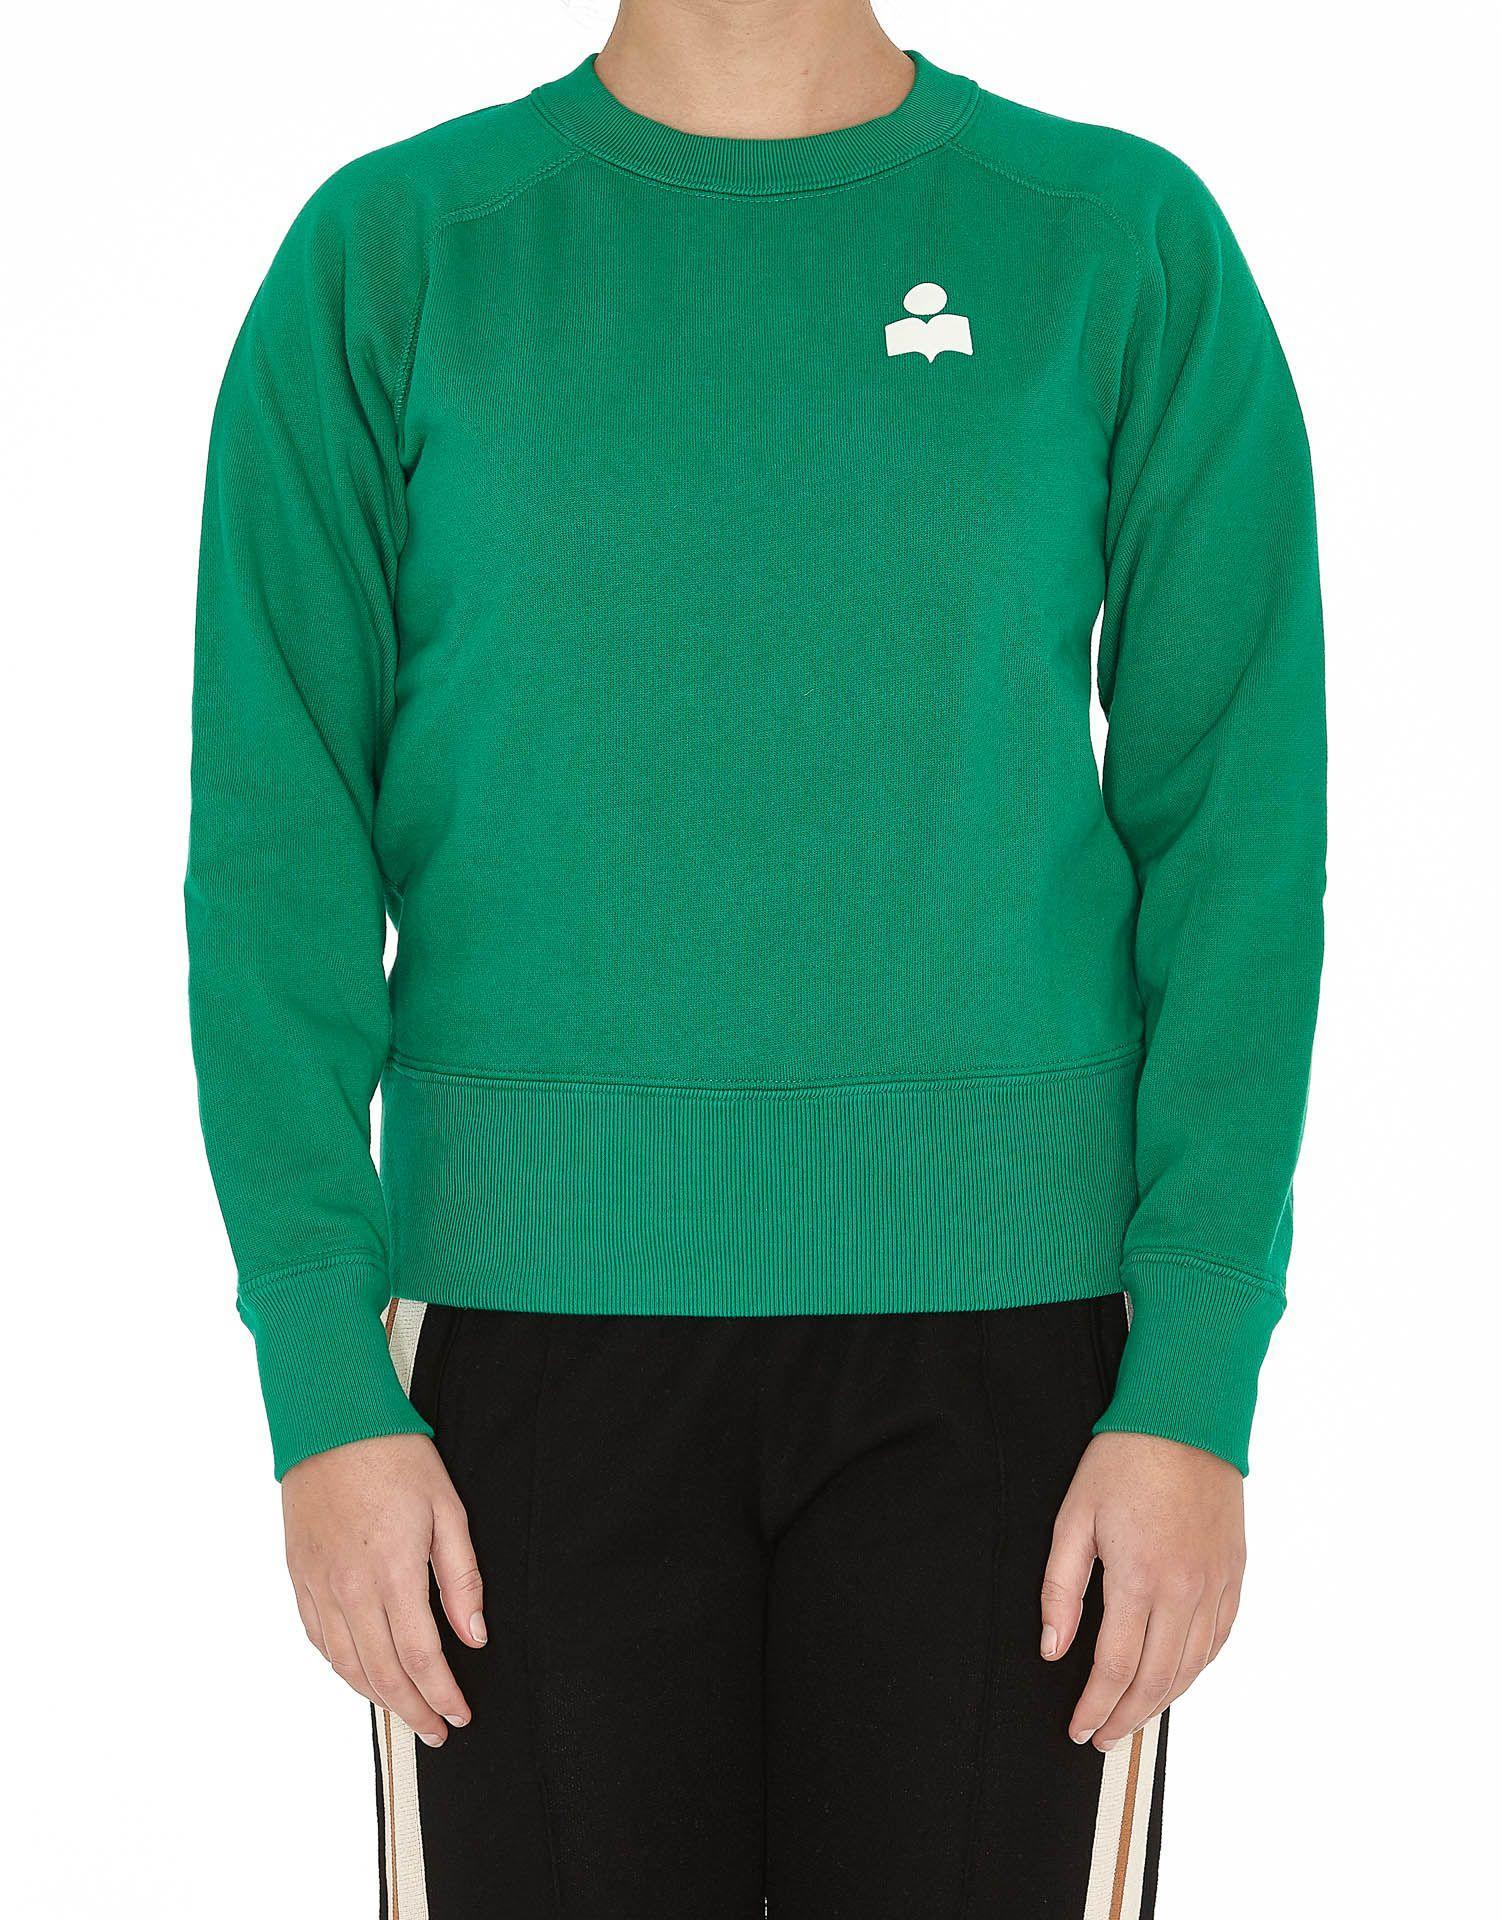 Etoile Isabel Marant Makati Sweatshirt In Green